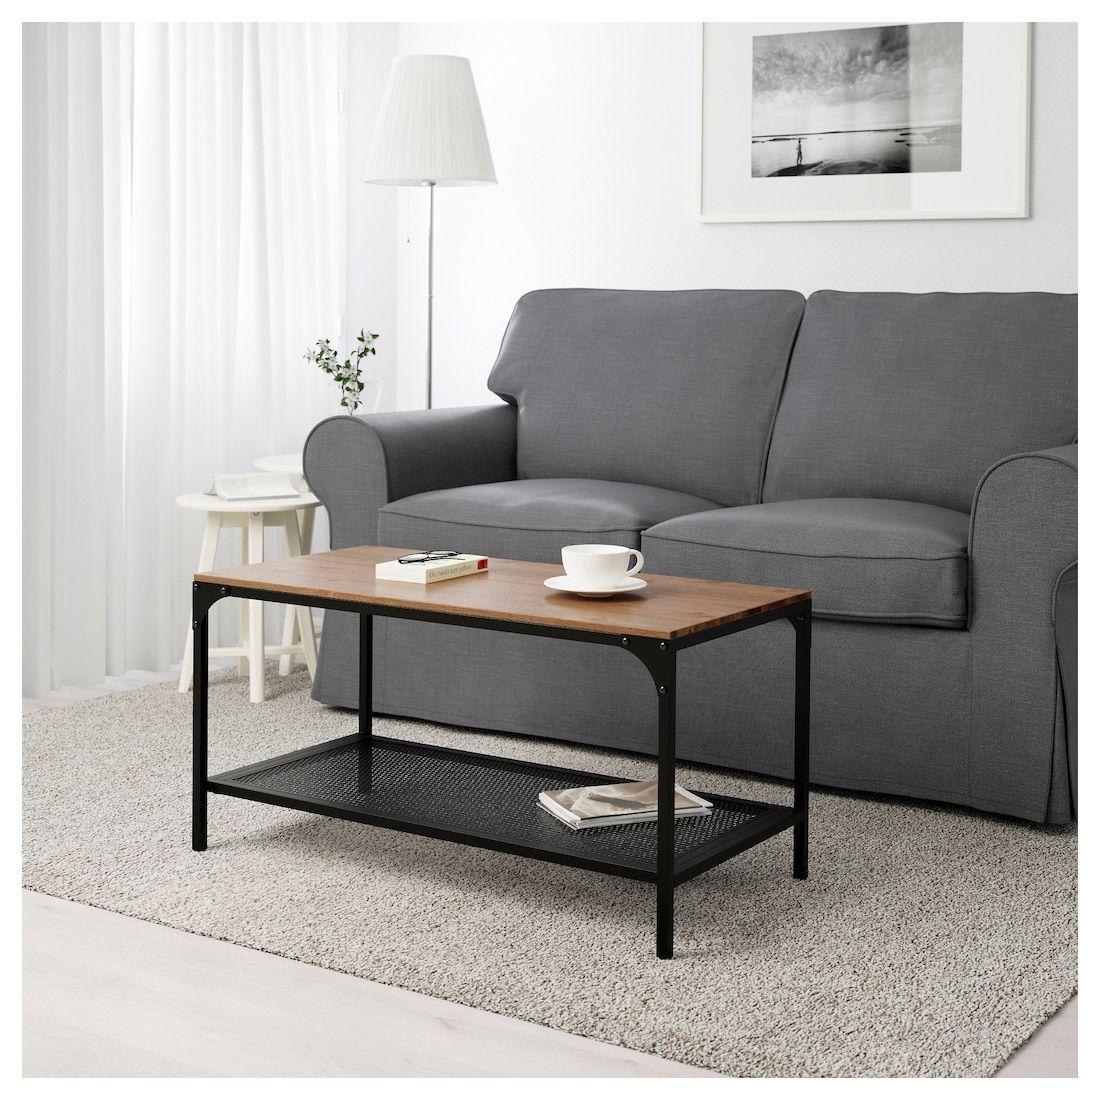 IKEA FJALLBO Black Coffee table Small living rooms